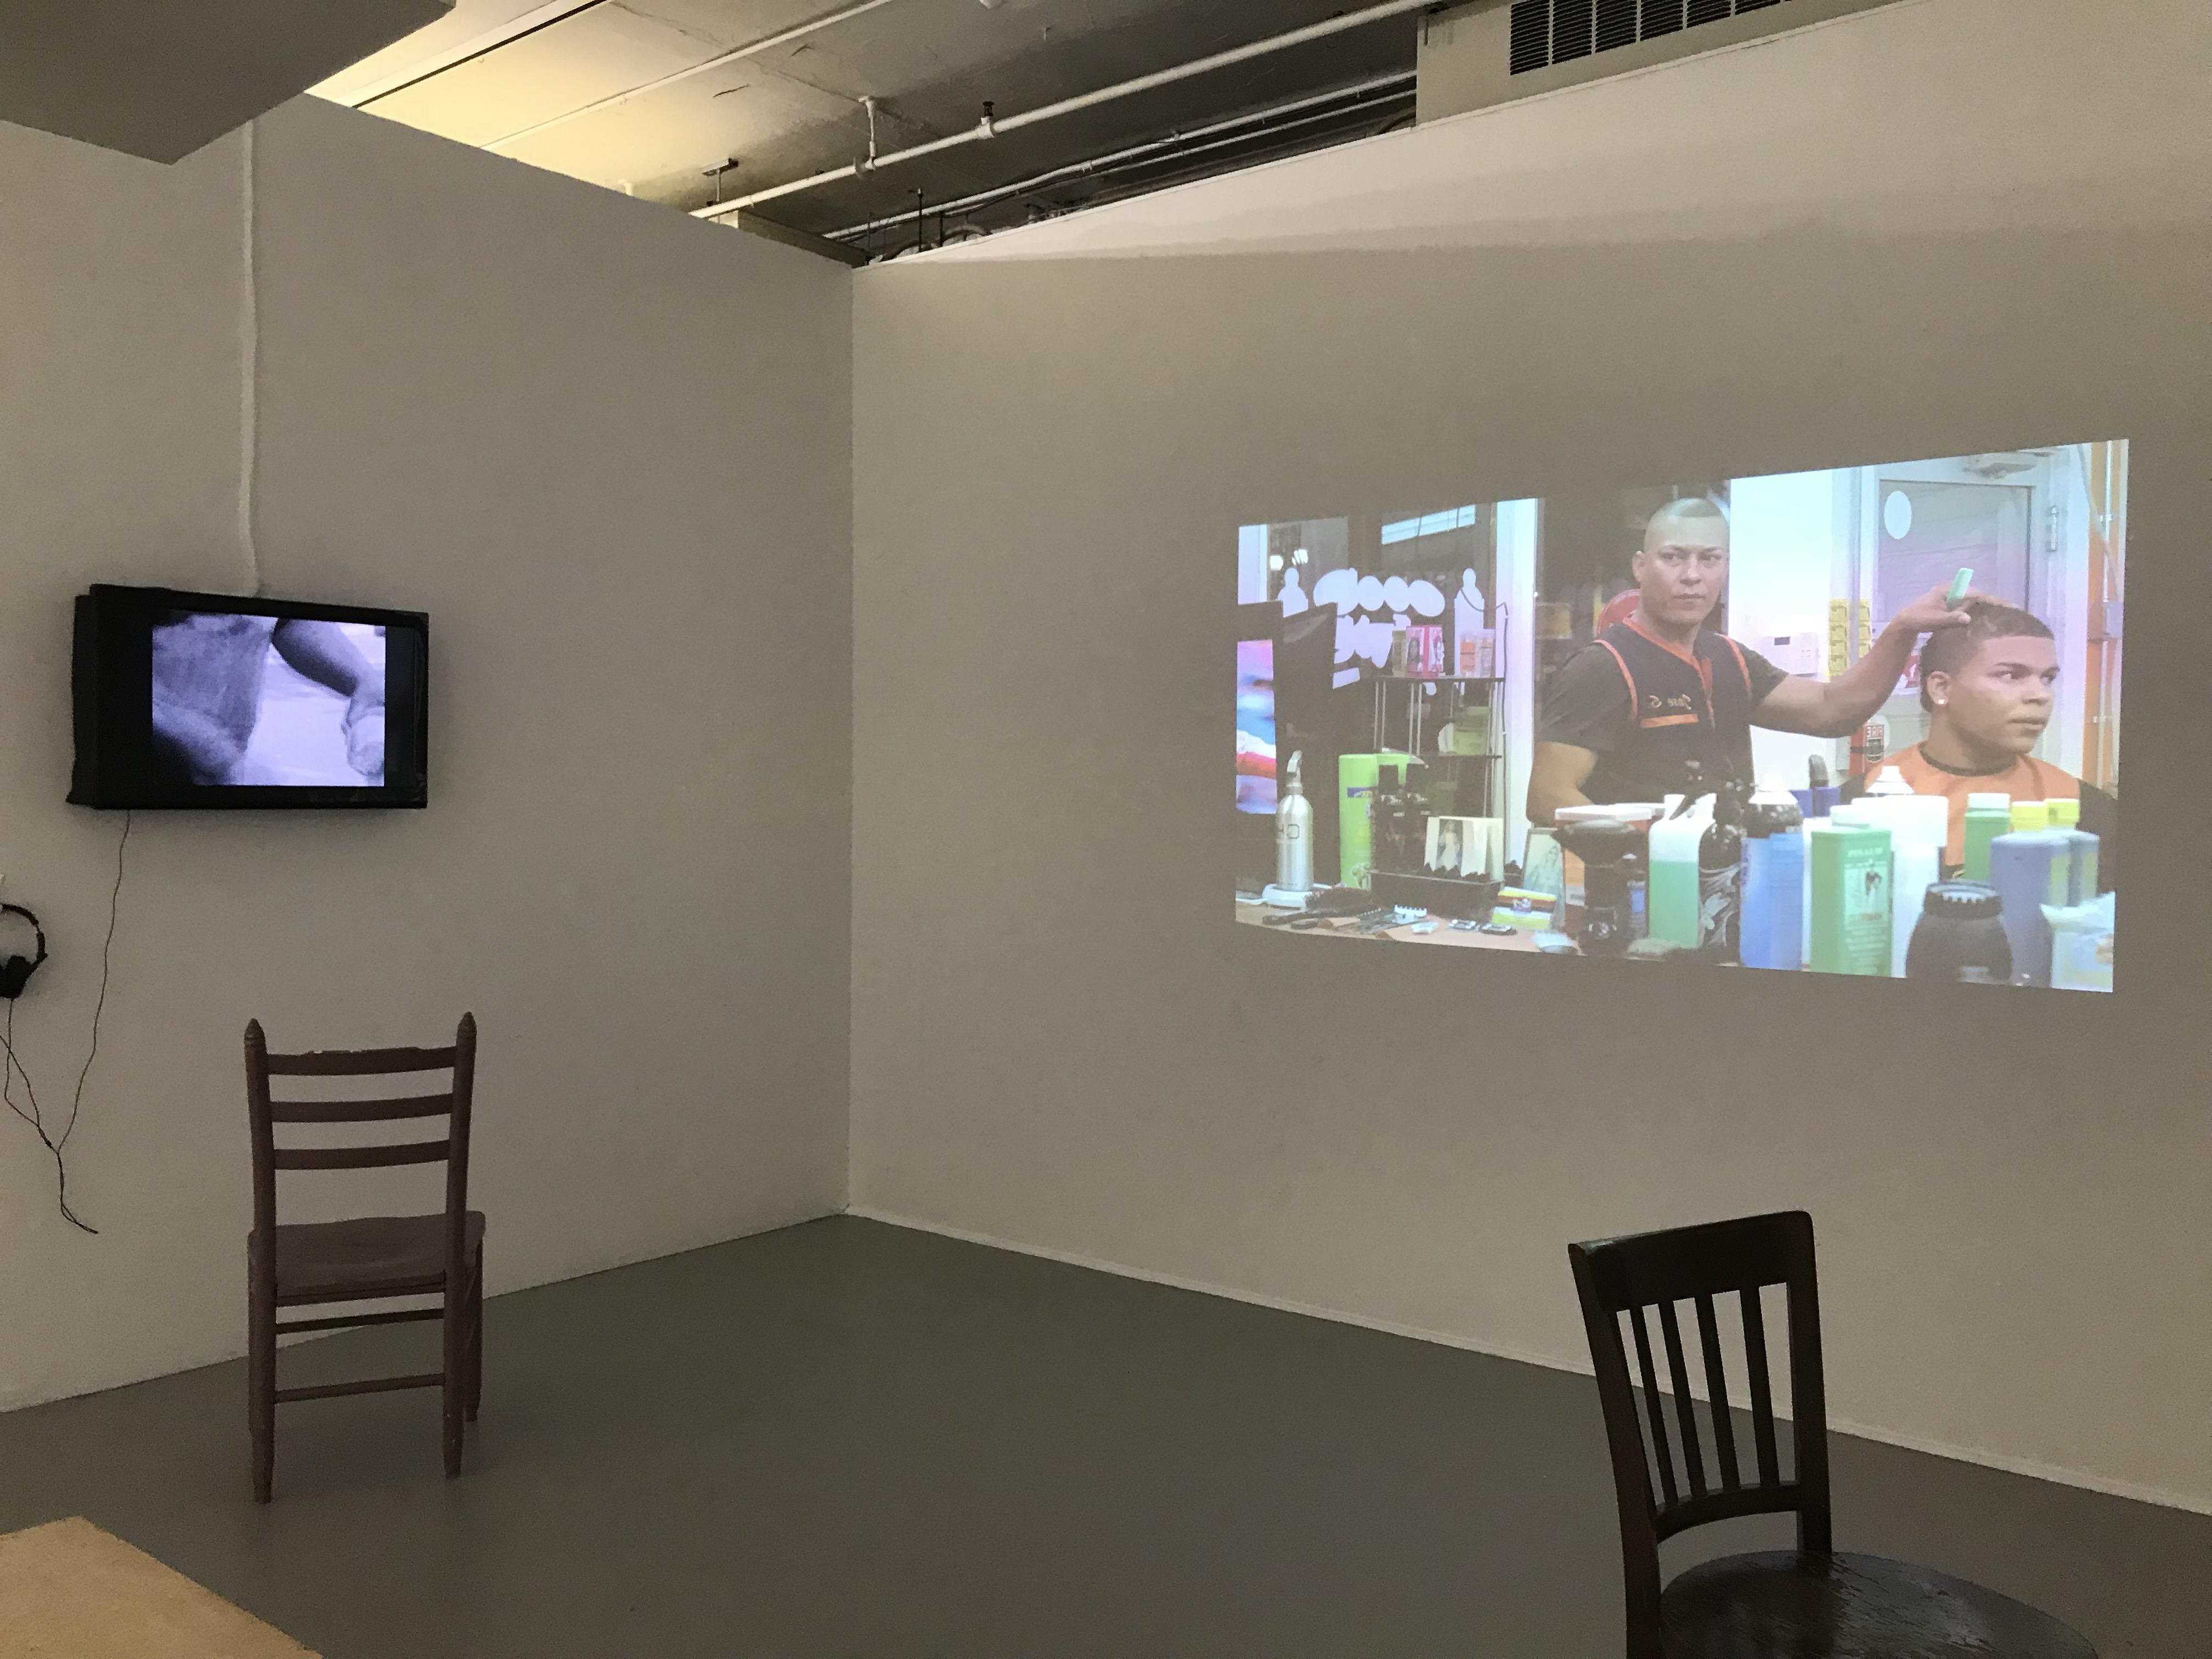 Gallery exhibit